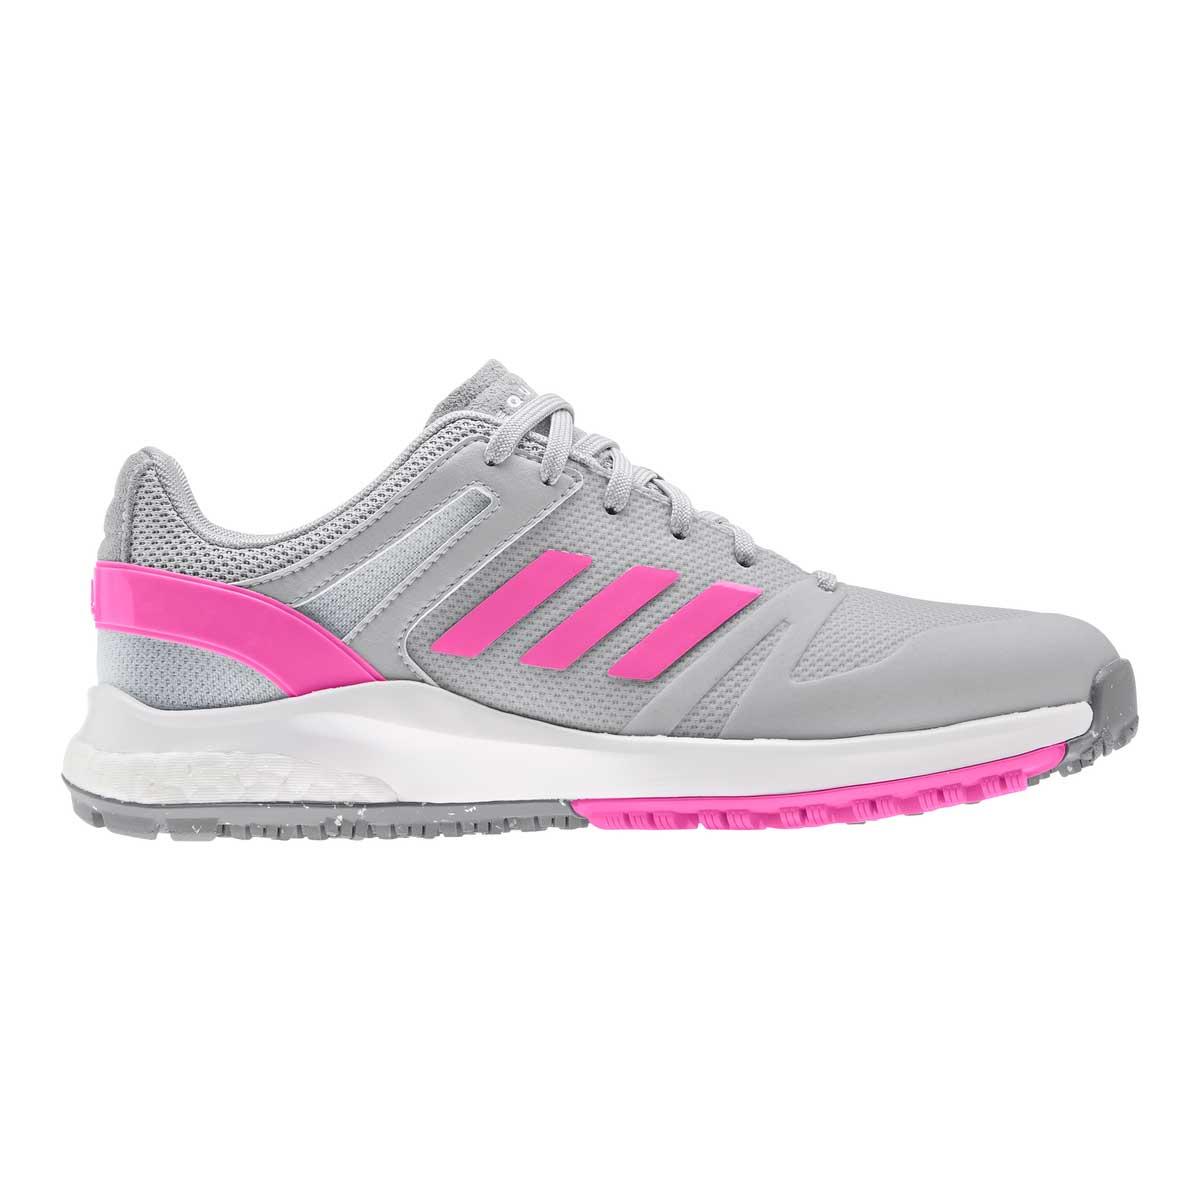 Adidas Women's EQT Spikeless Grey/Screaming Pink Golf Shoe